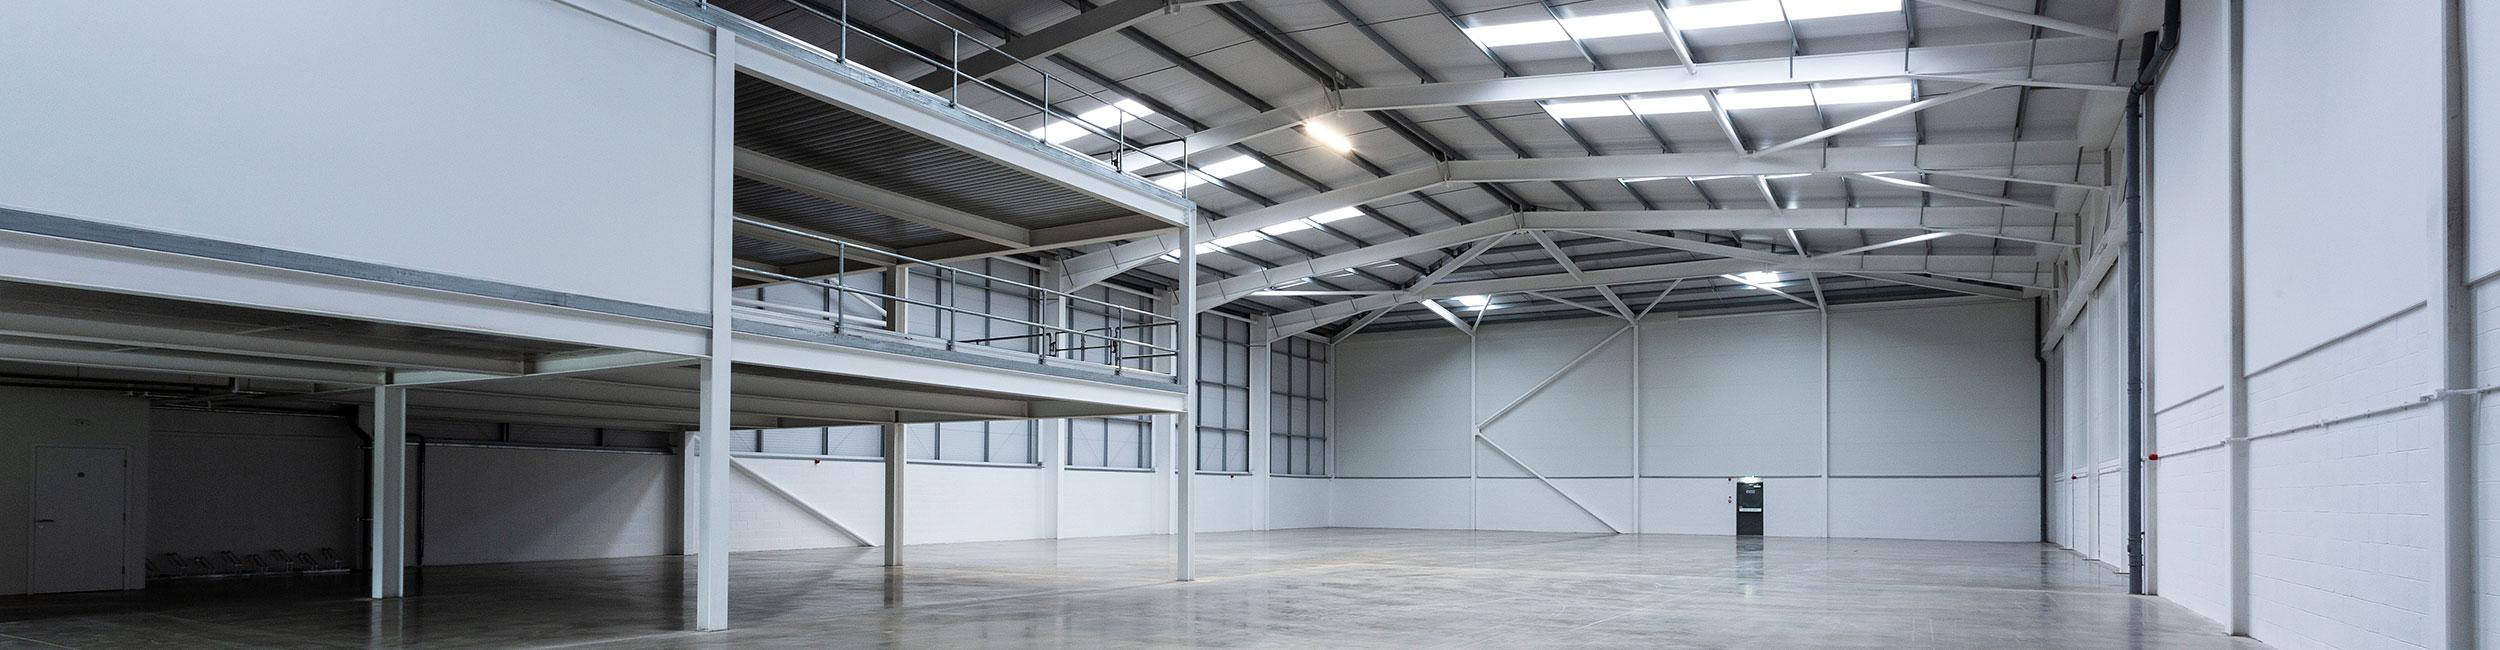 Mitchell Design & Construction - Enaflo Interiors